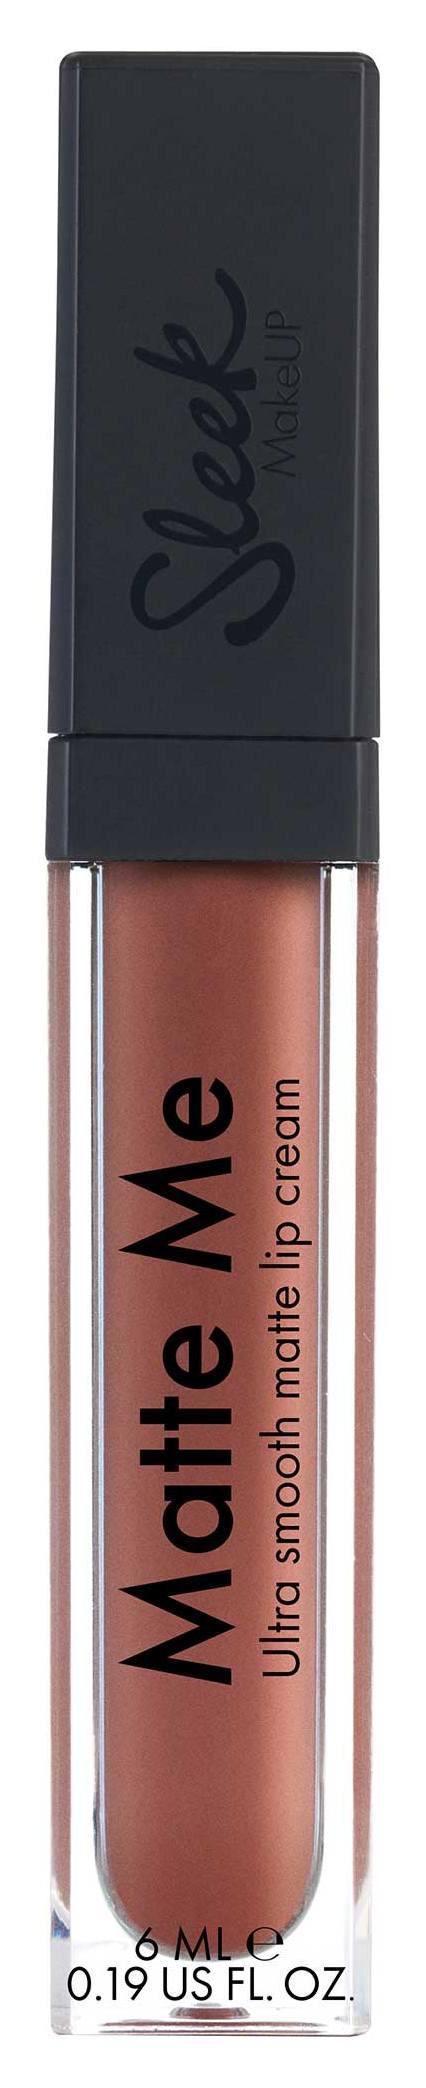 SLEEK MakeUP Блеск для губ 1160 / Cinnamon Spice MATTE ME 25 г - Блески для губ